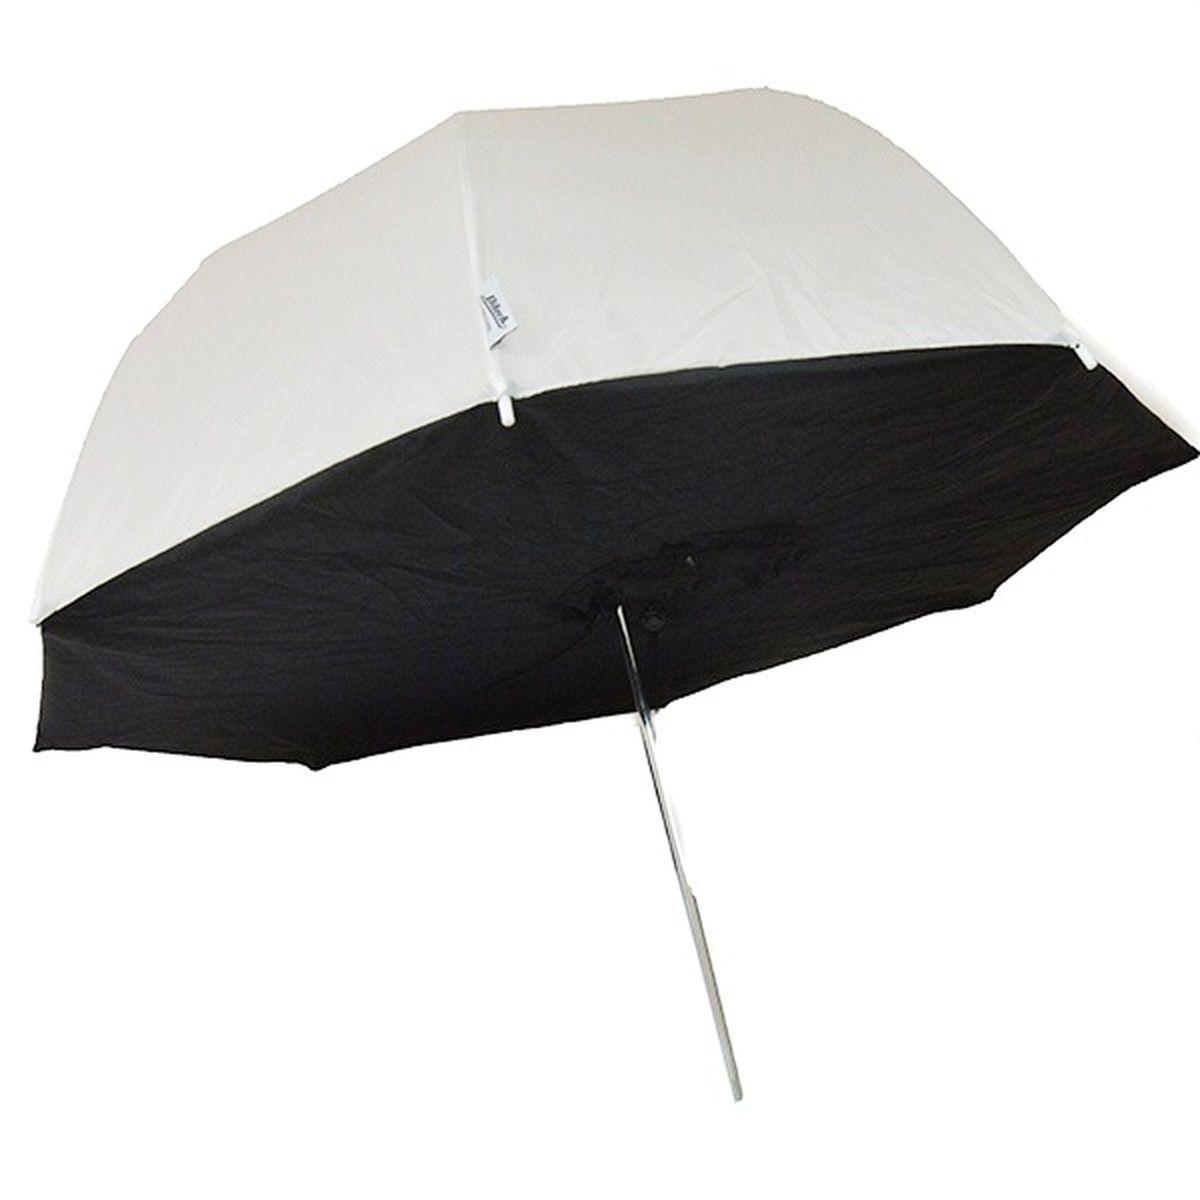 Ditech UBS40WB, White Black зонт-софтбокс для фотосъемки